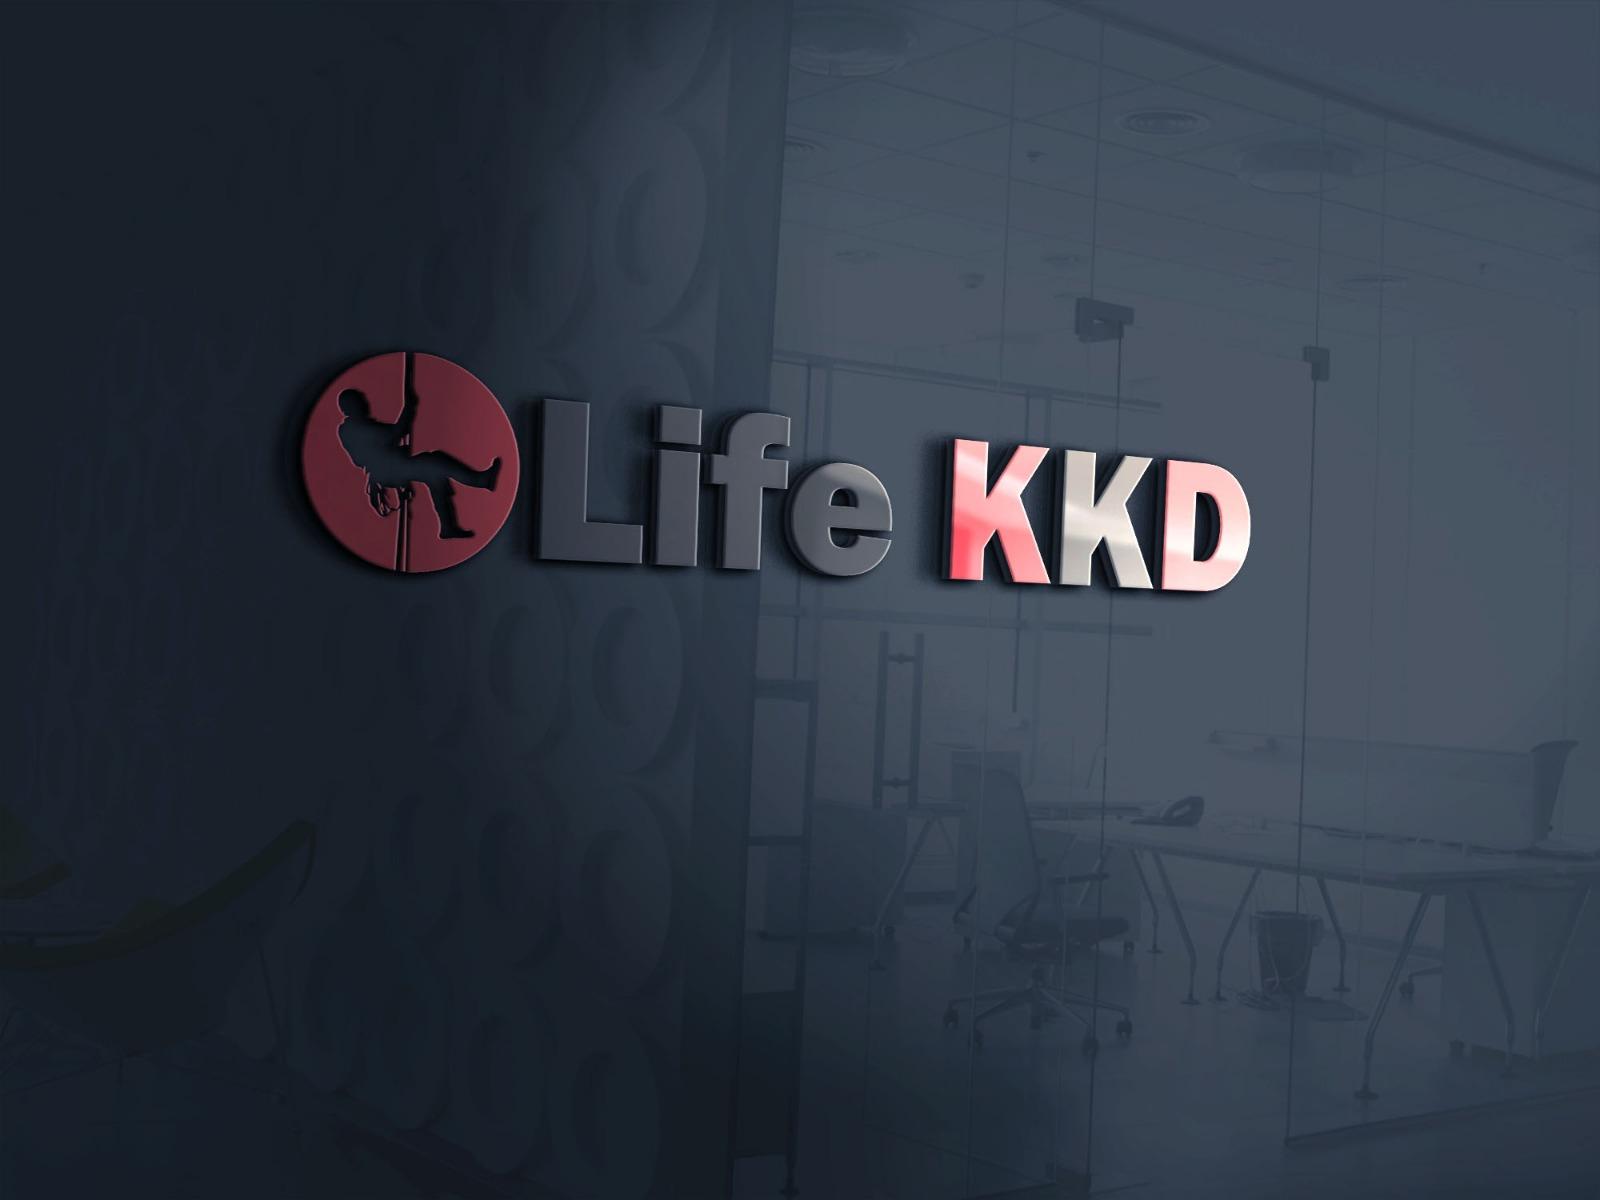 Life KKD